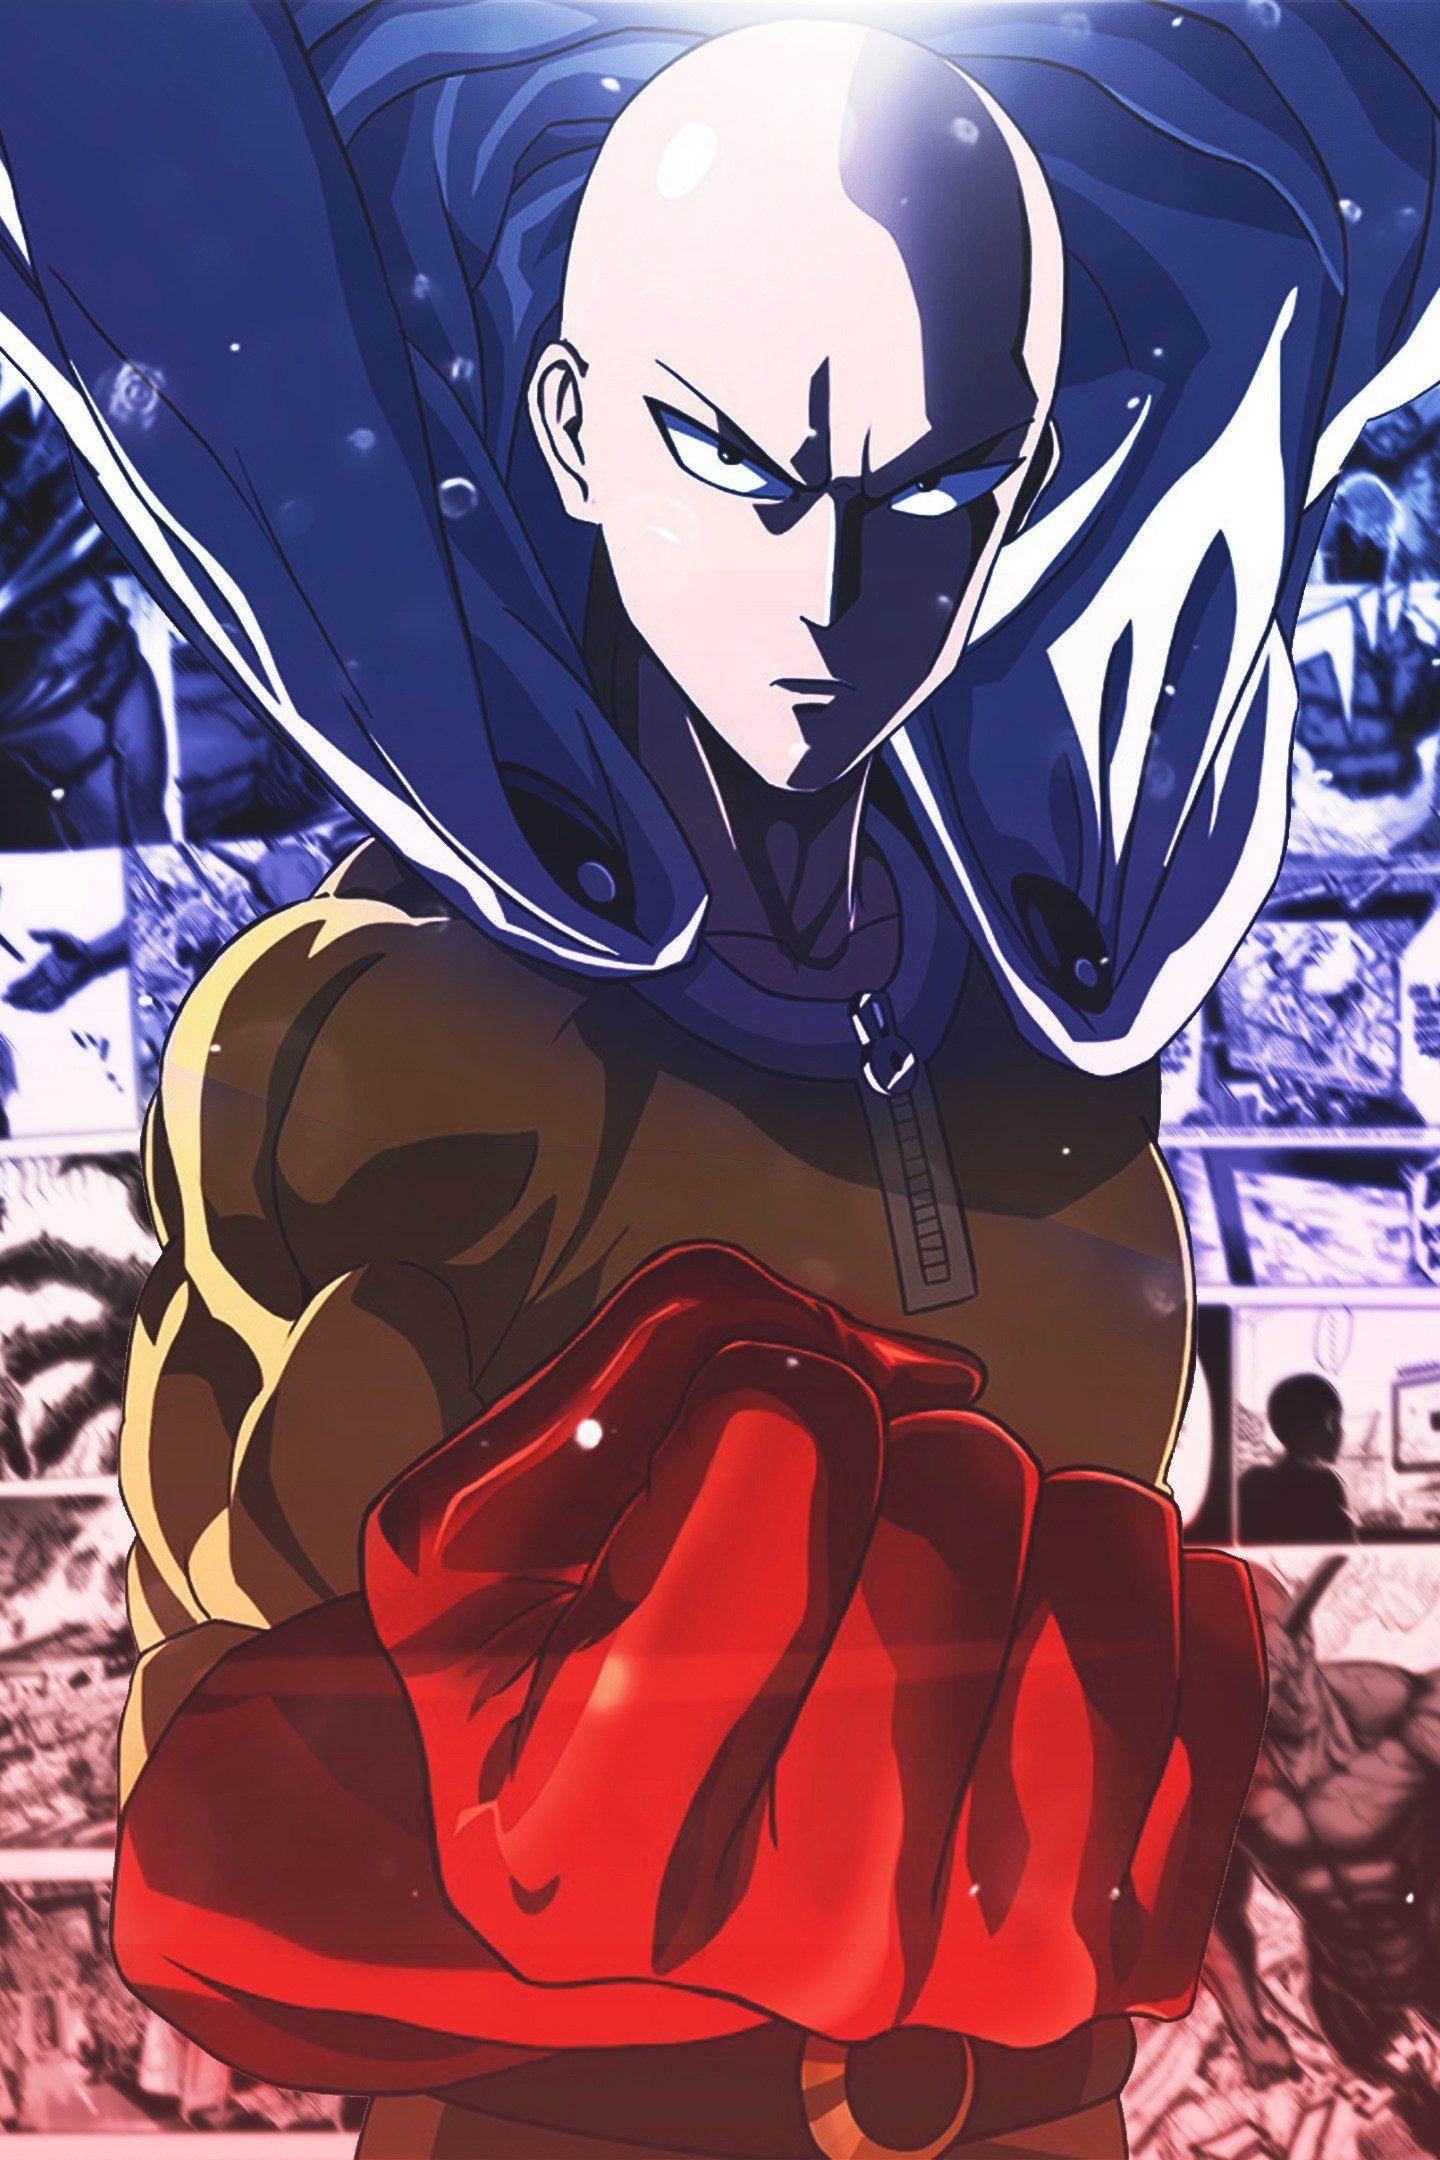 Download 1440x2880 Wallpaper Saitama Onepunch Man Anime Bald